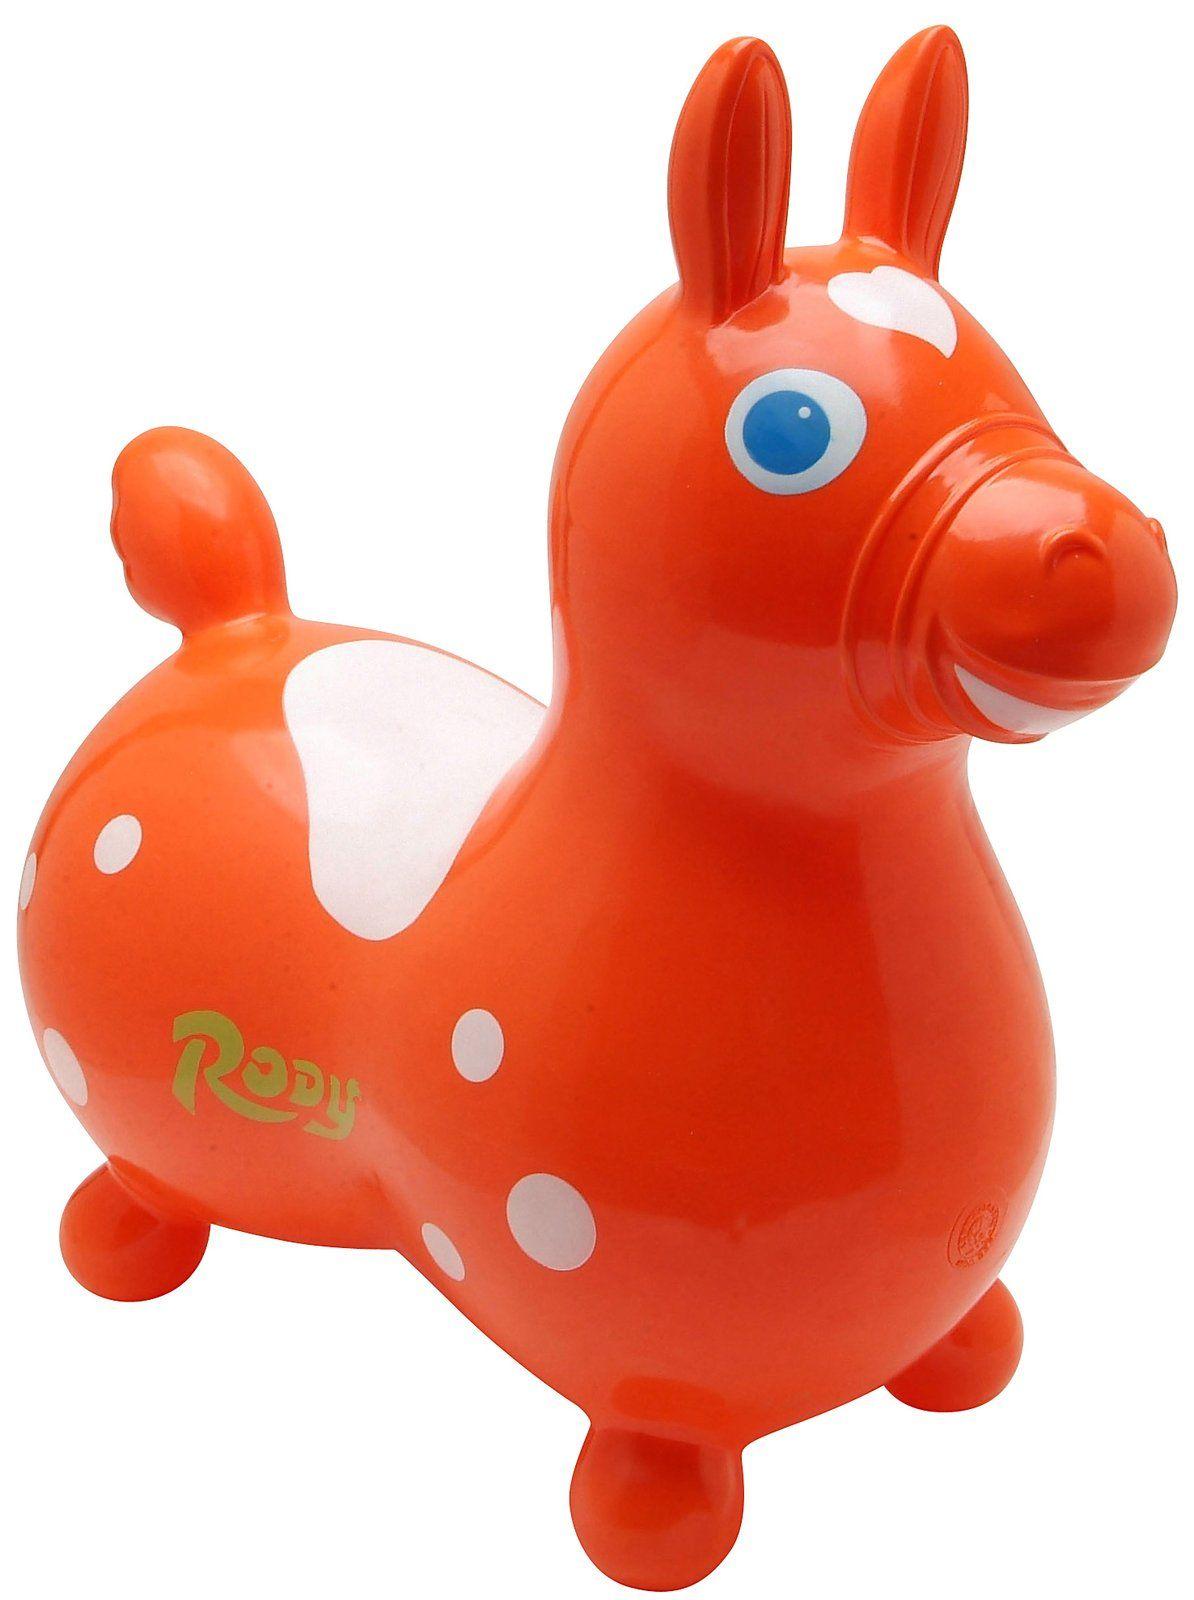 Gymnic Rody Horse Orange Rody Horse Toddler Toys Toddler Gifts